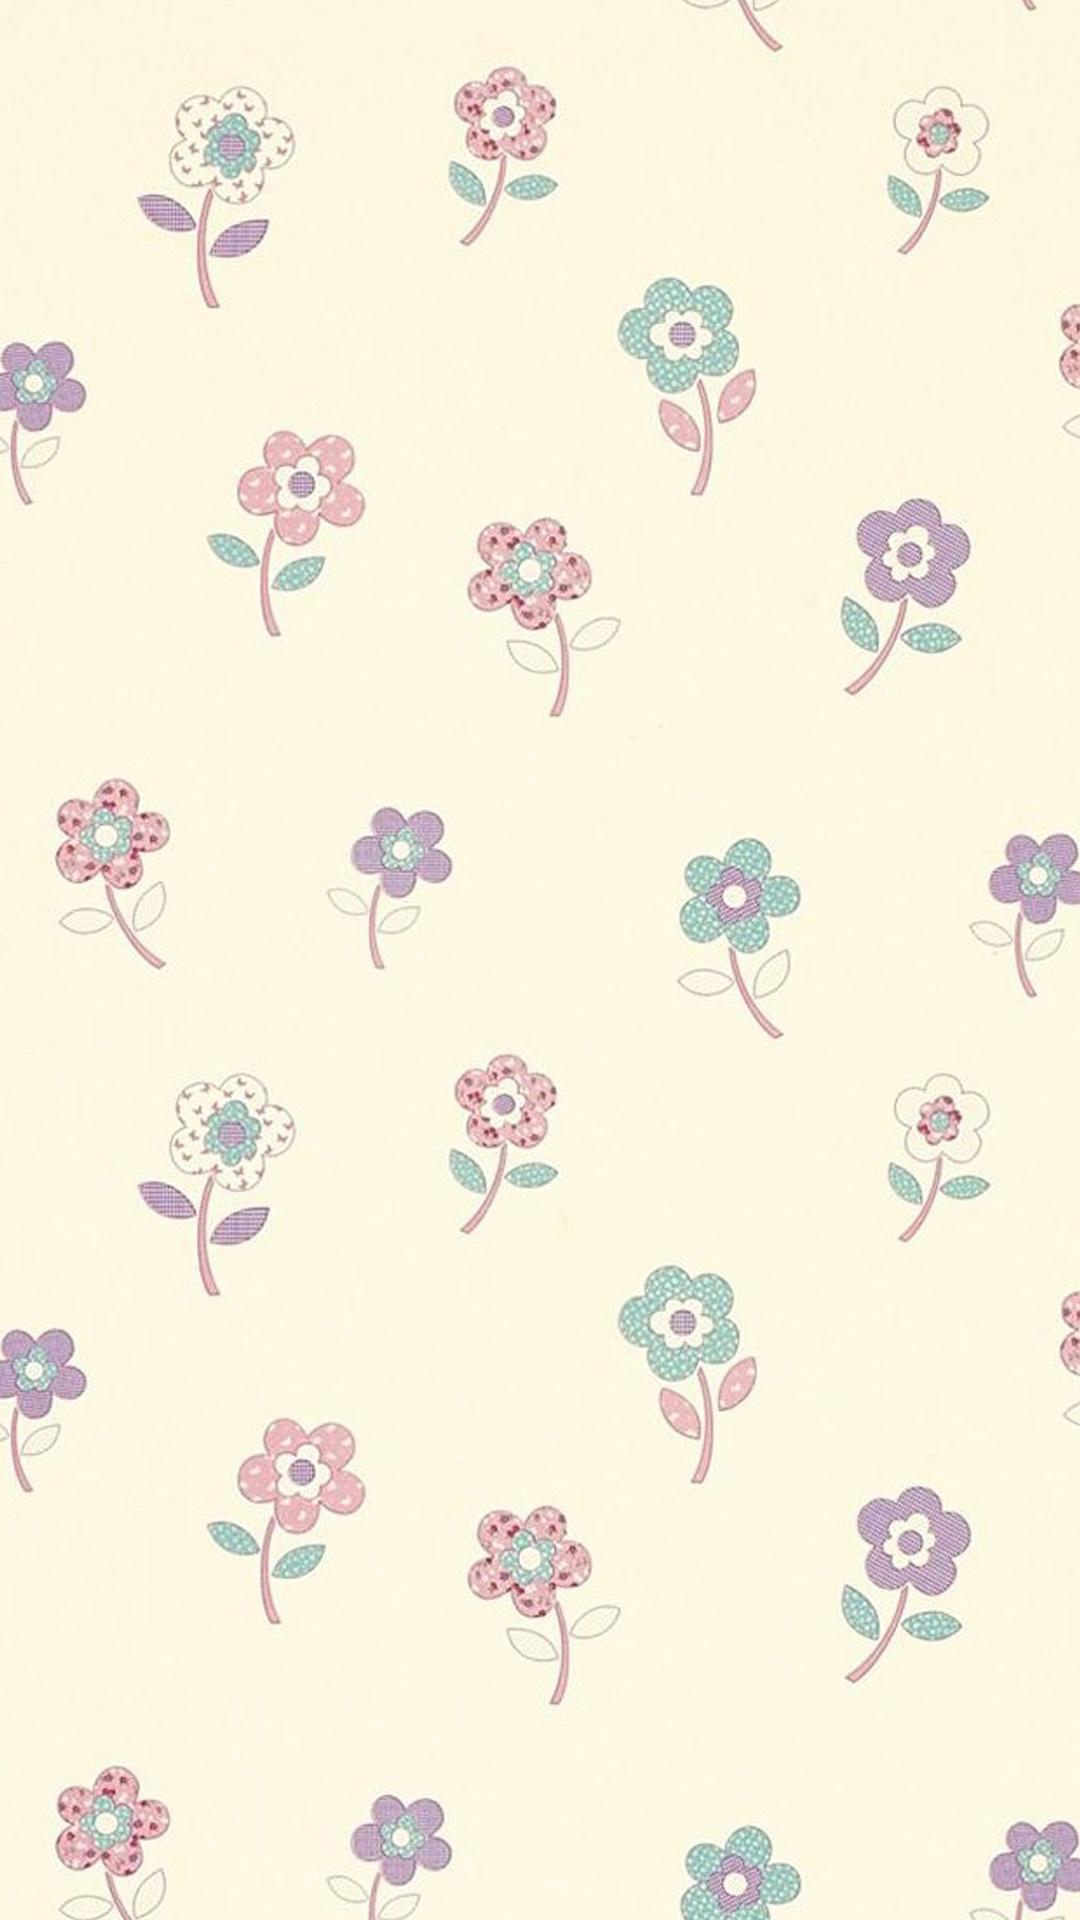 New Iphone Wallpaper Iphone Wallpaper